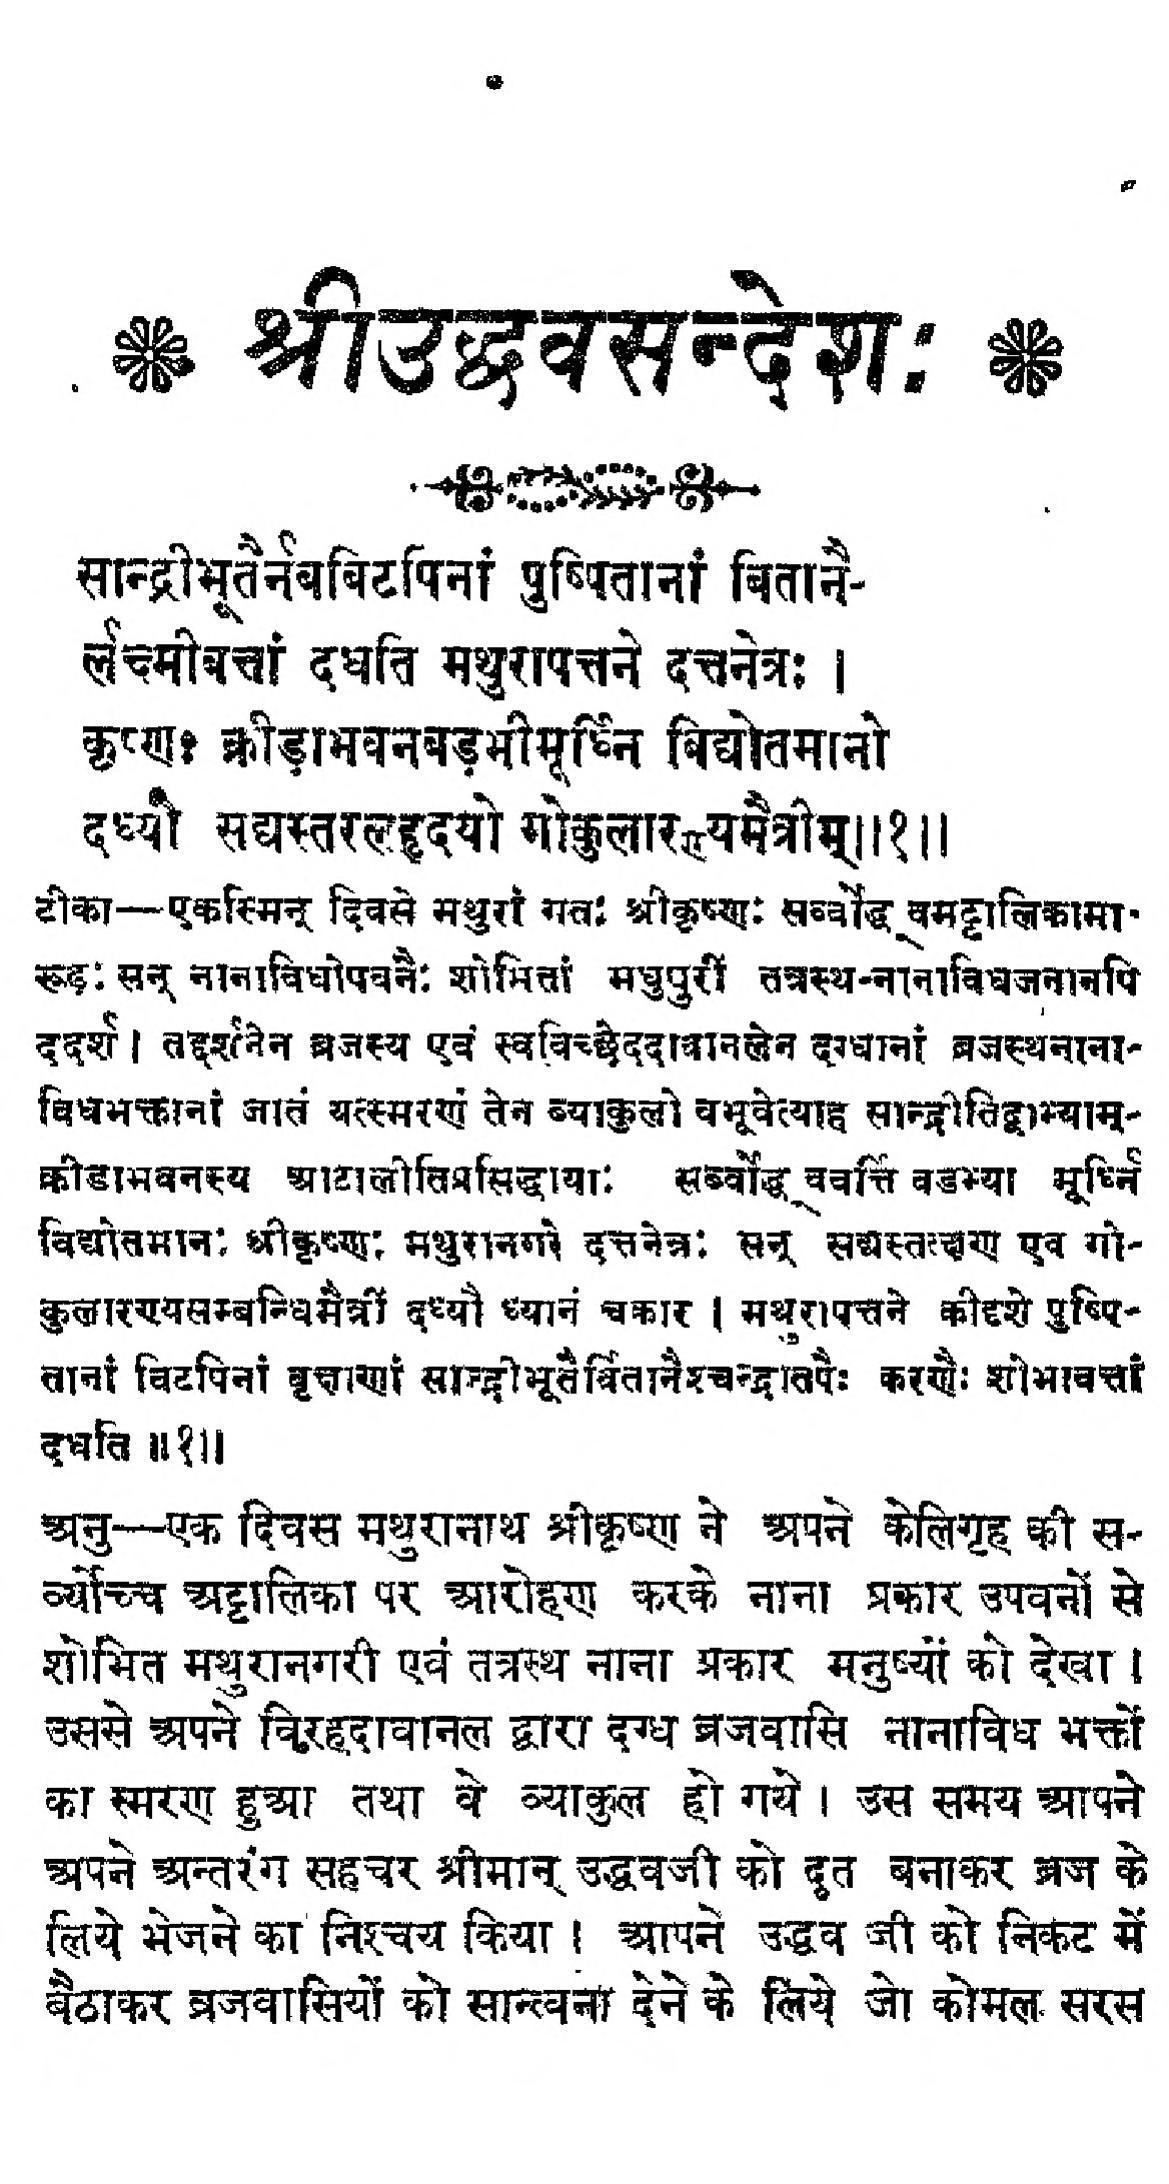 Book Image : श्री उध्दव सन्देश: - Shri Uddhav Sandesh